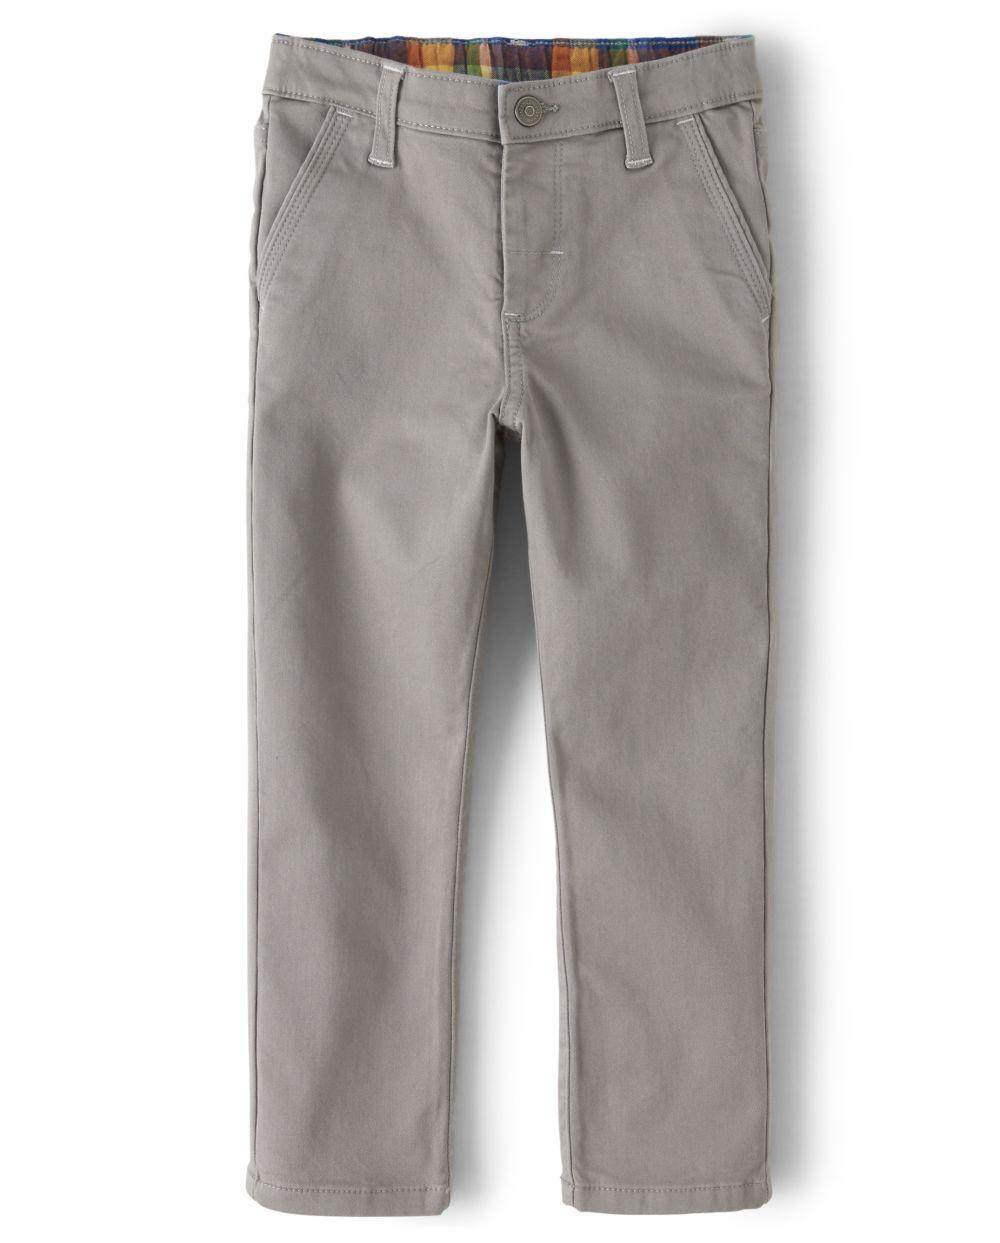 Boys Chino Pants - Demolition Dude